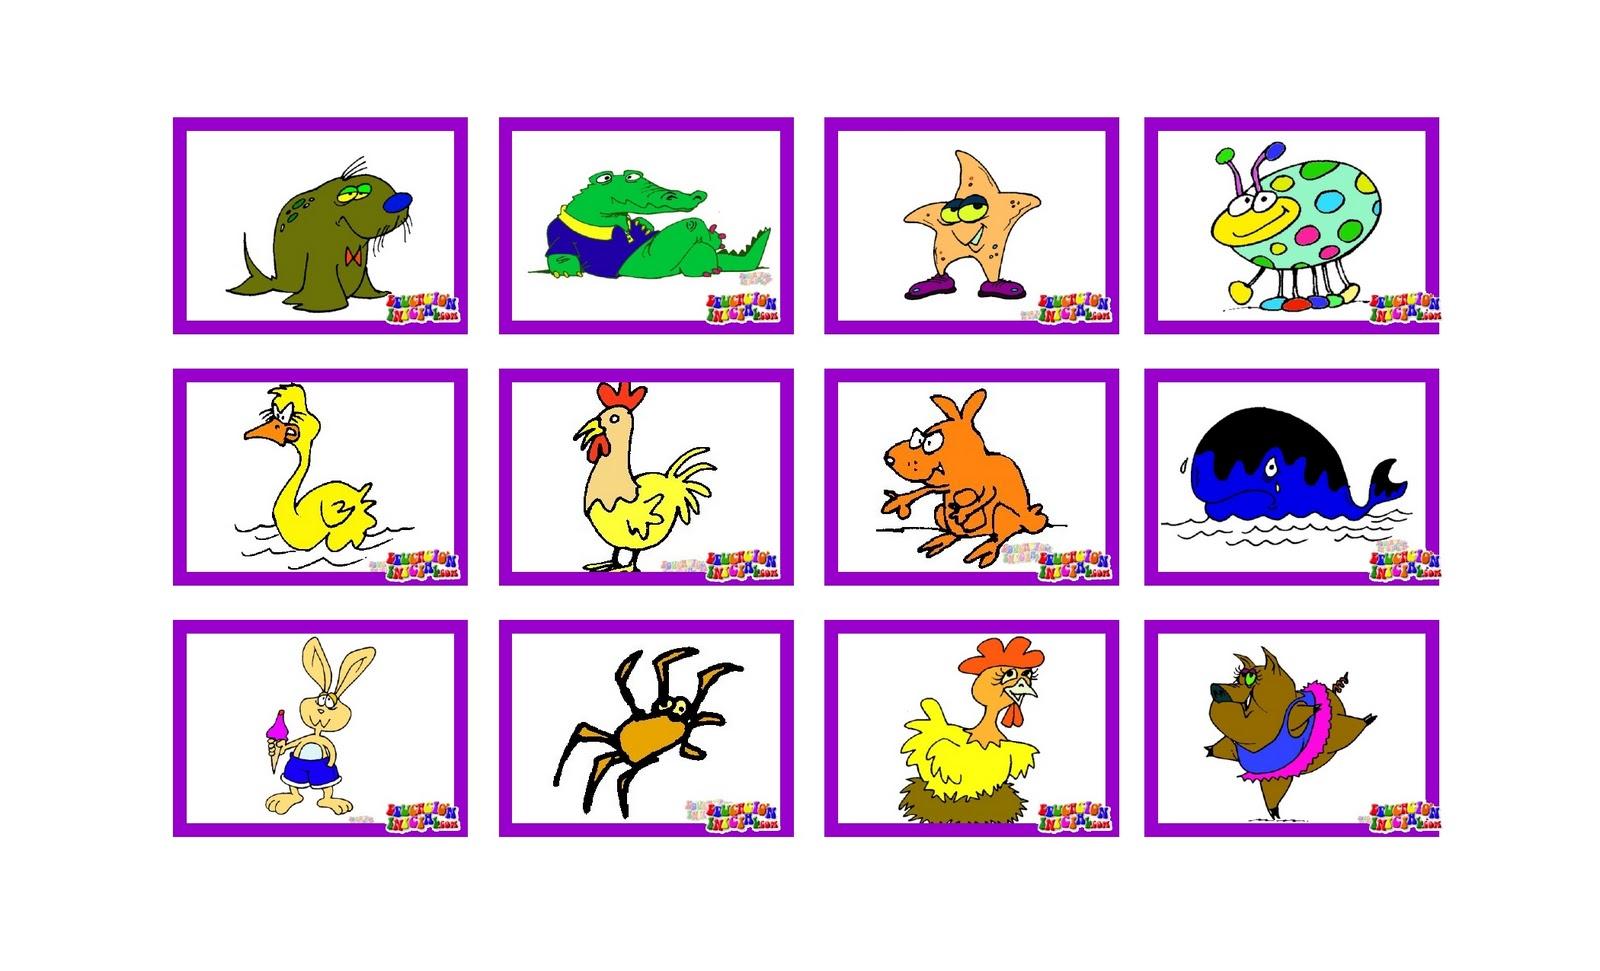 Cuentos Infantiles Cortos Para Colorear E Imprimir Imagui: Loterias Infantiles Para Imprimir